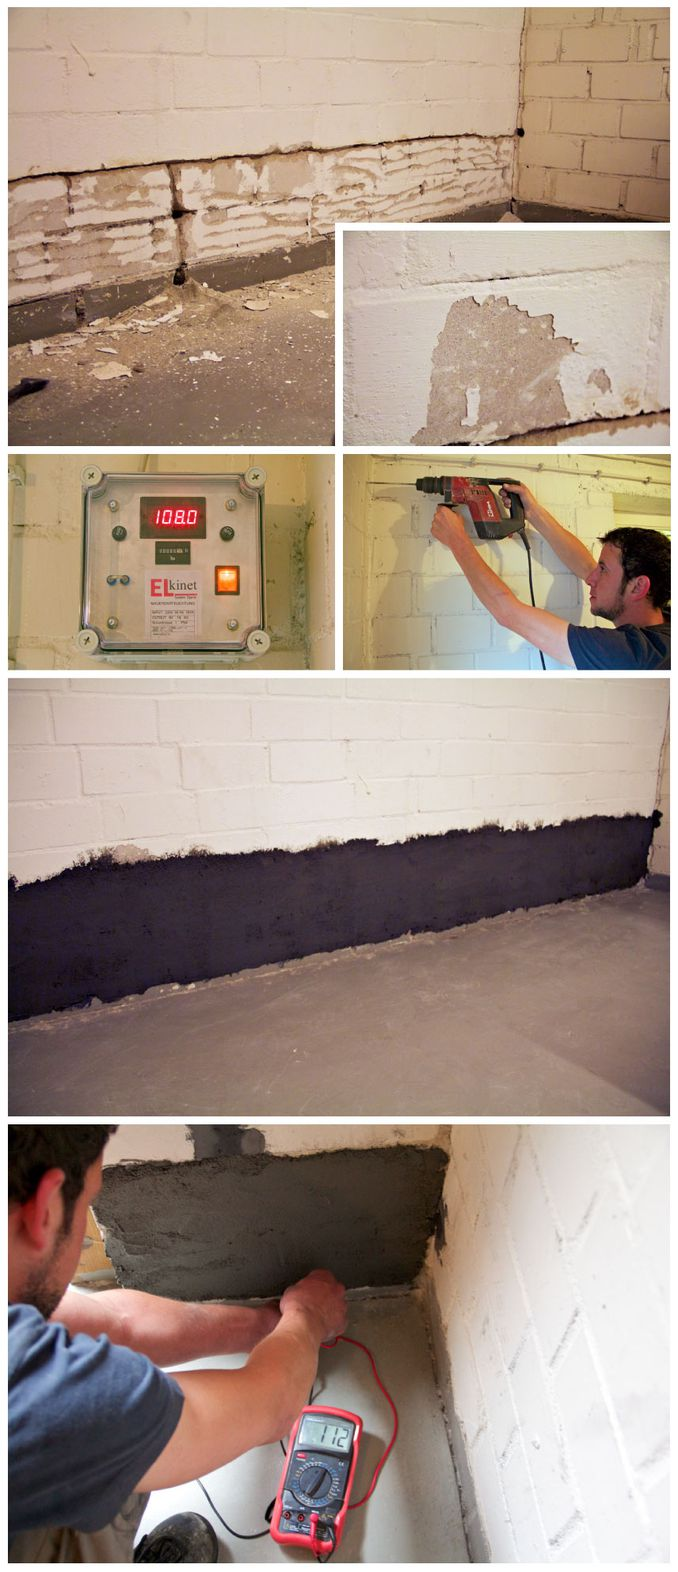 Mauertrocknung - Blatt Trocknungstechnik Mauertrockenlegung Mit